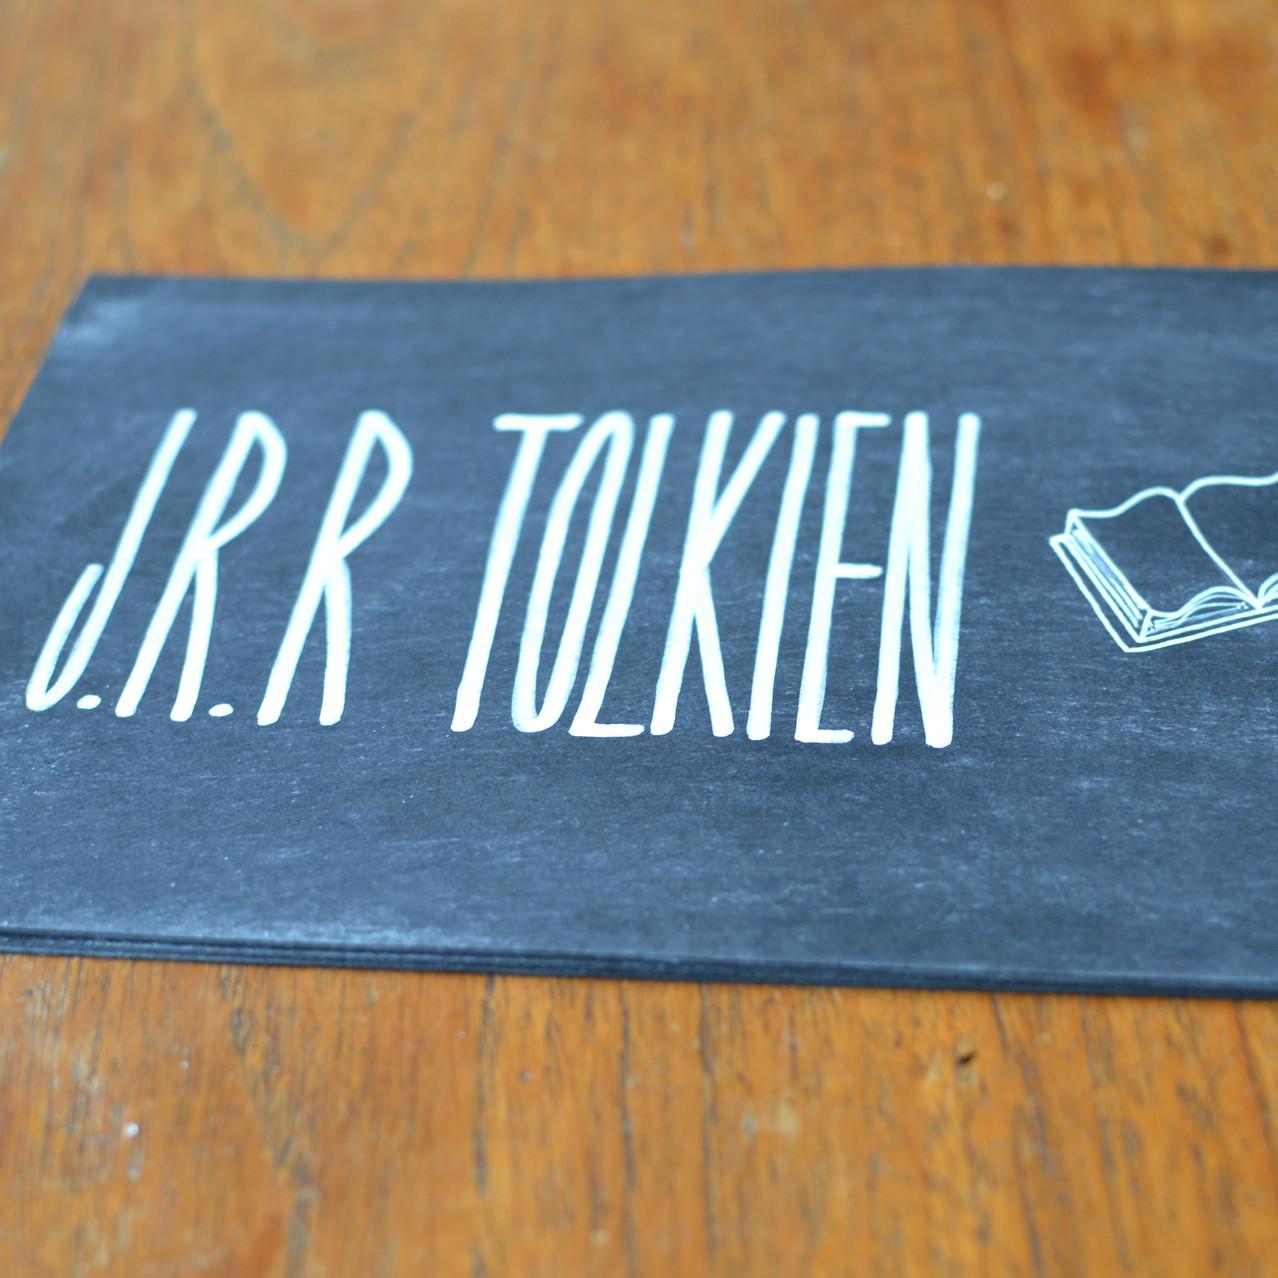 Chalkboard table number signs - Emm9